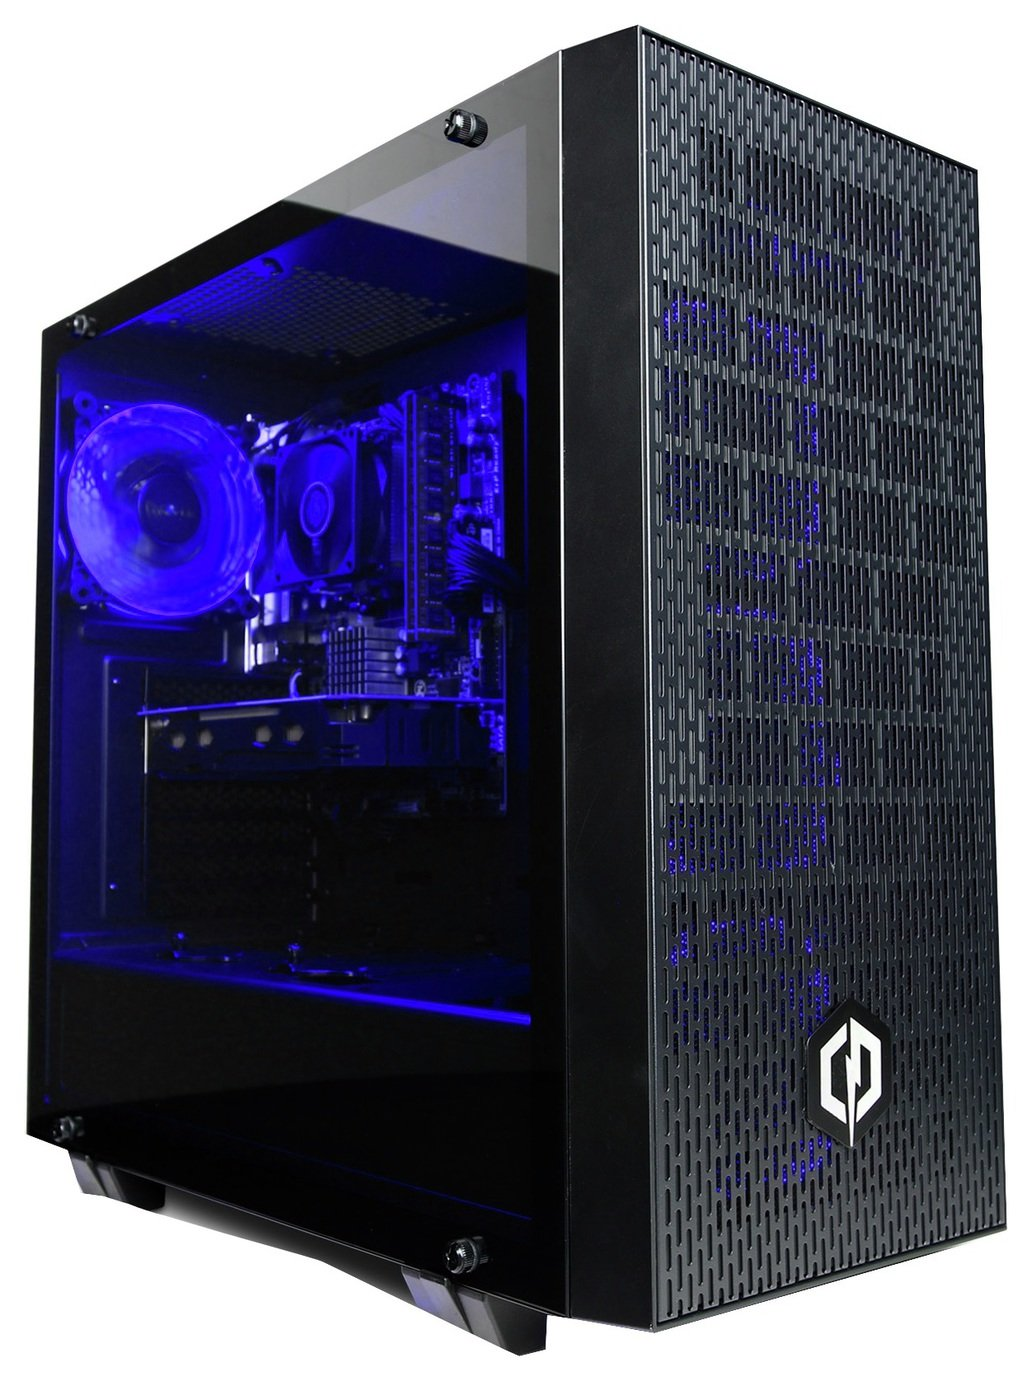 Image of Cyberpower PC Aries i5 8GB 2TB GTX1050Ti Gaming PC